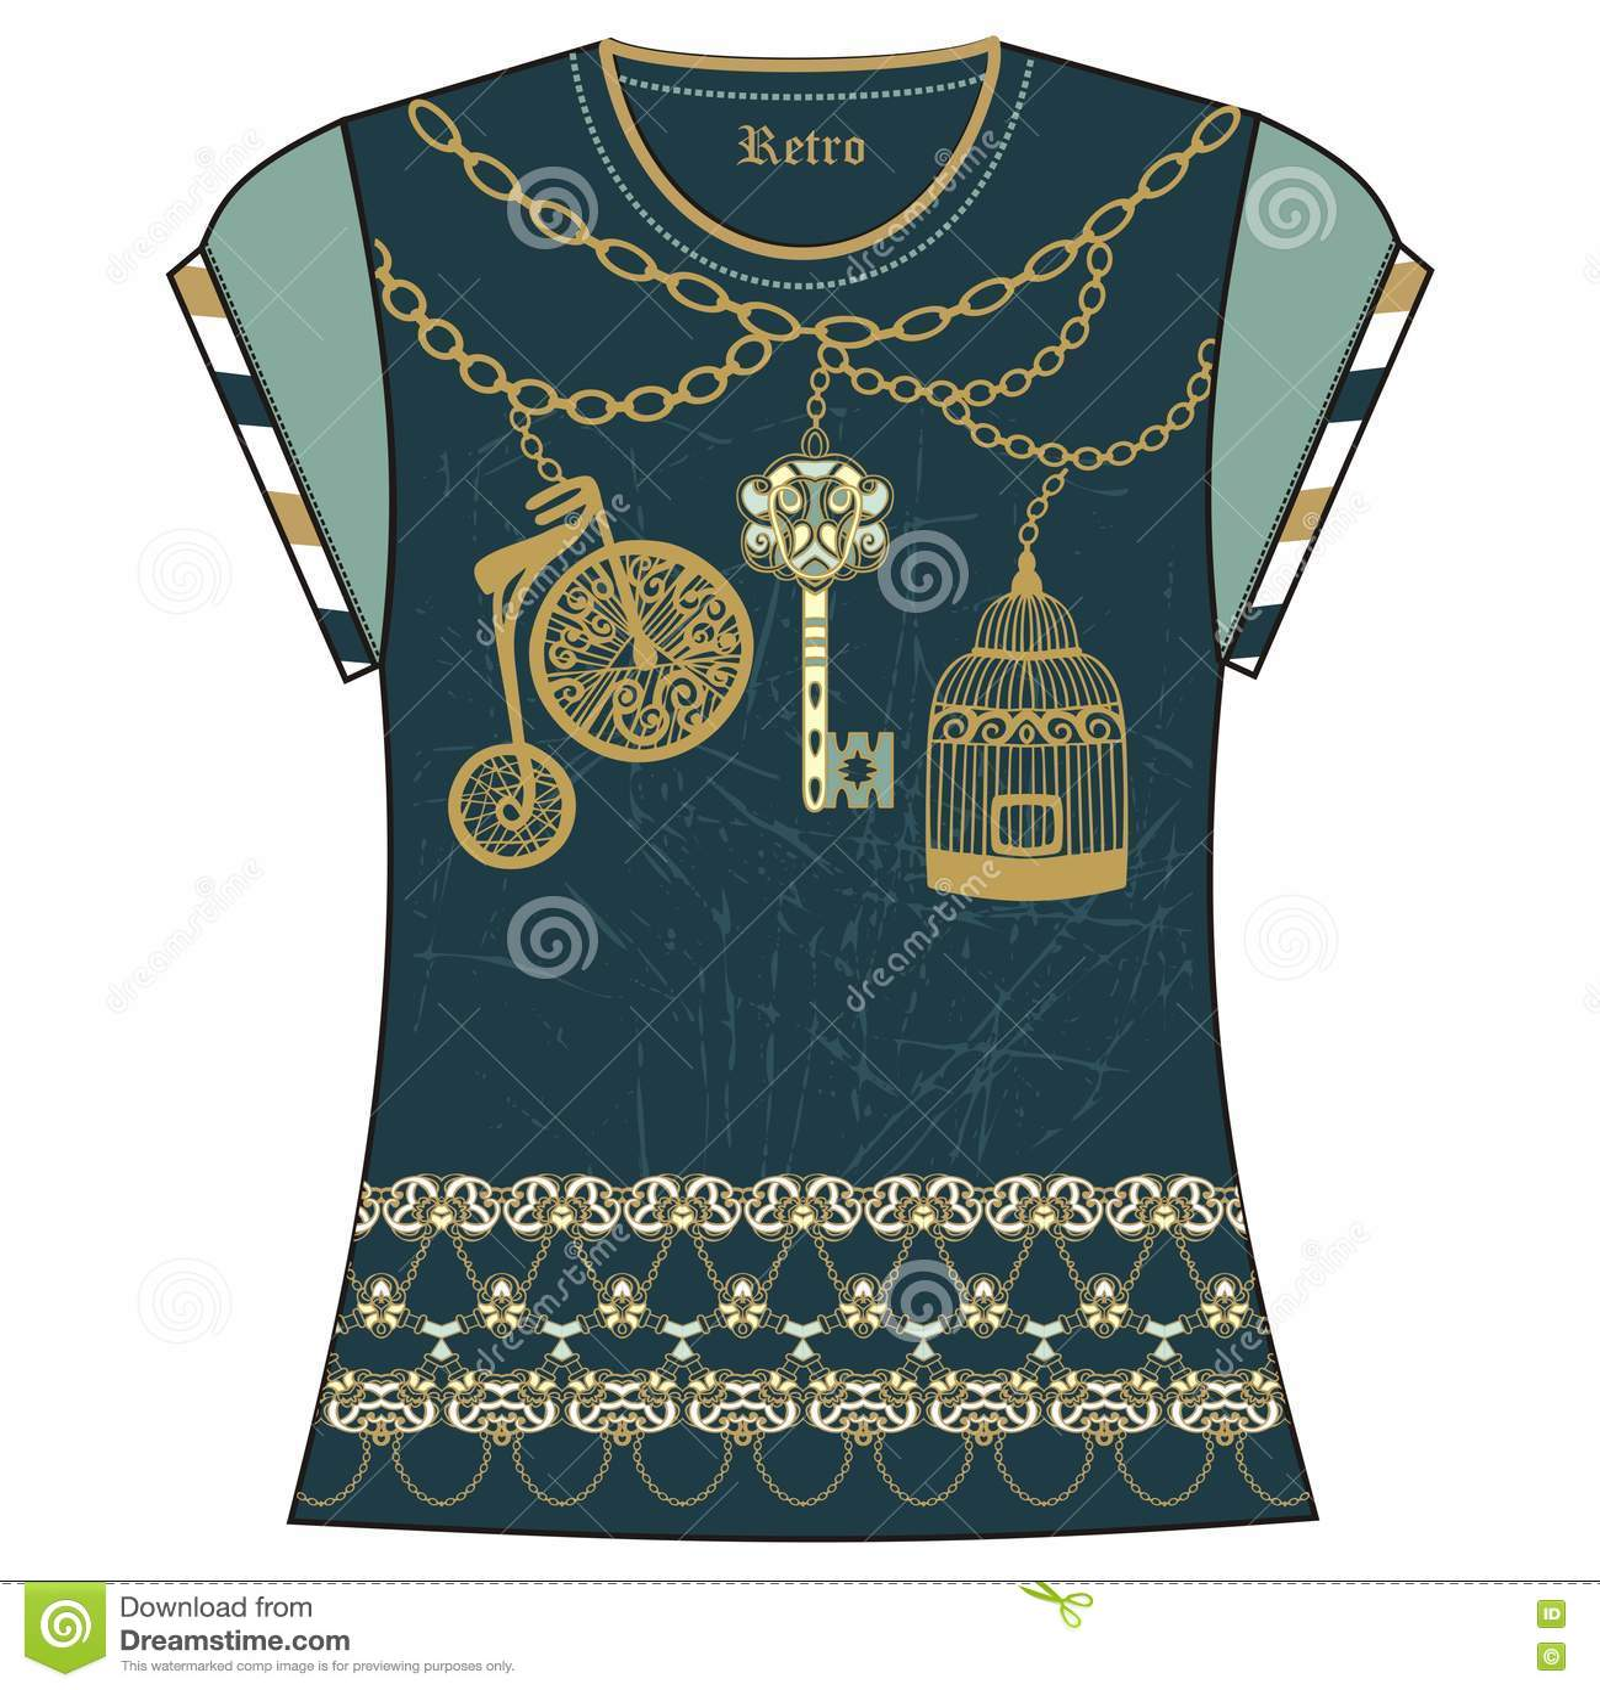 Retro Female Fashion T Shirt Print Design Of Heraldic Key Bird Cage